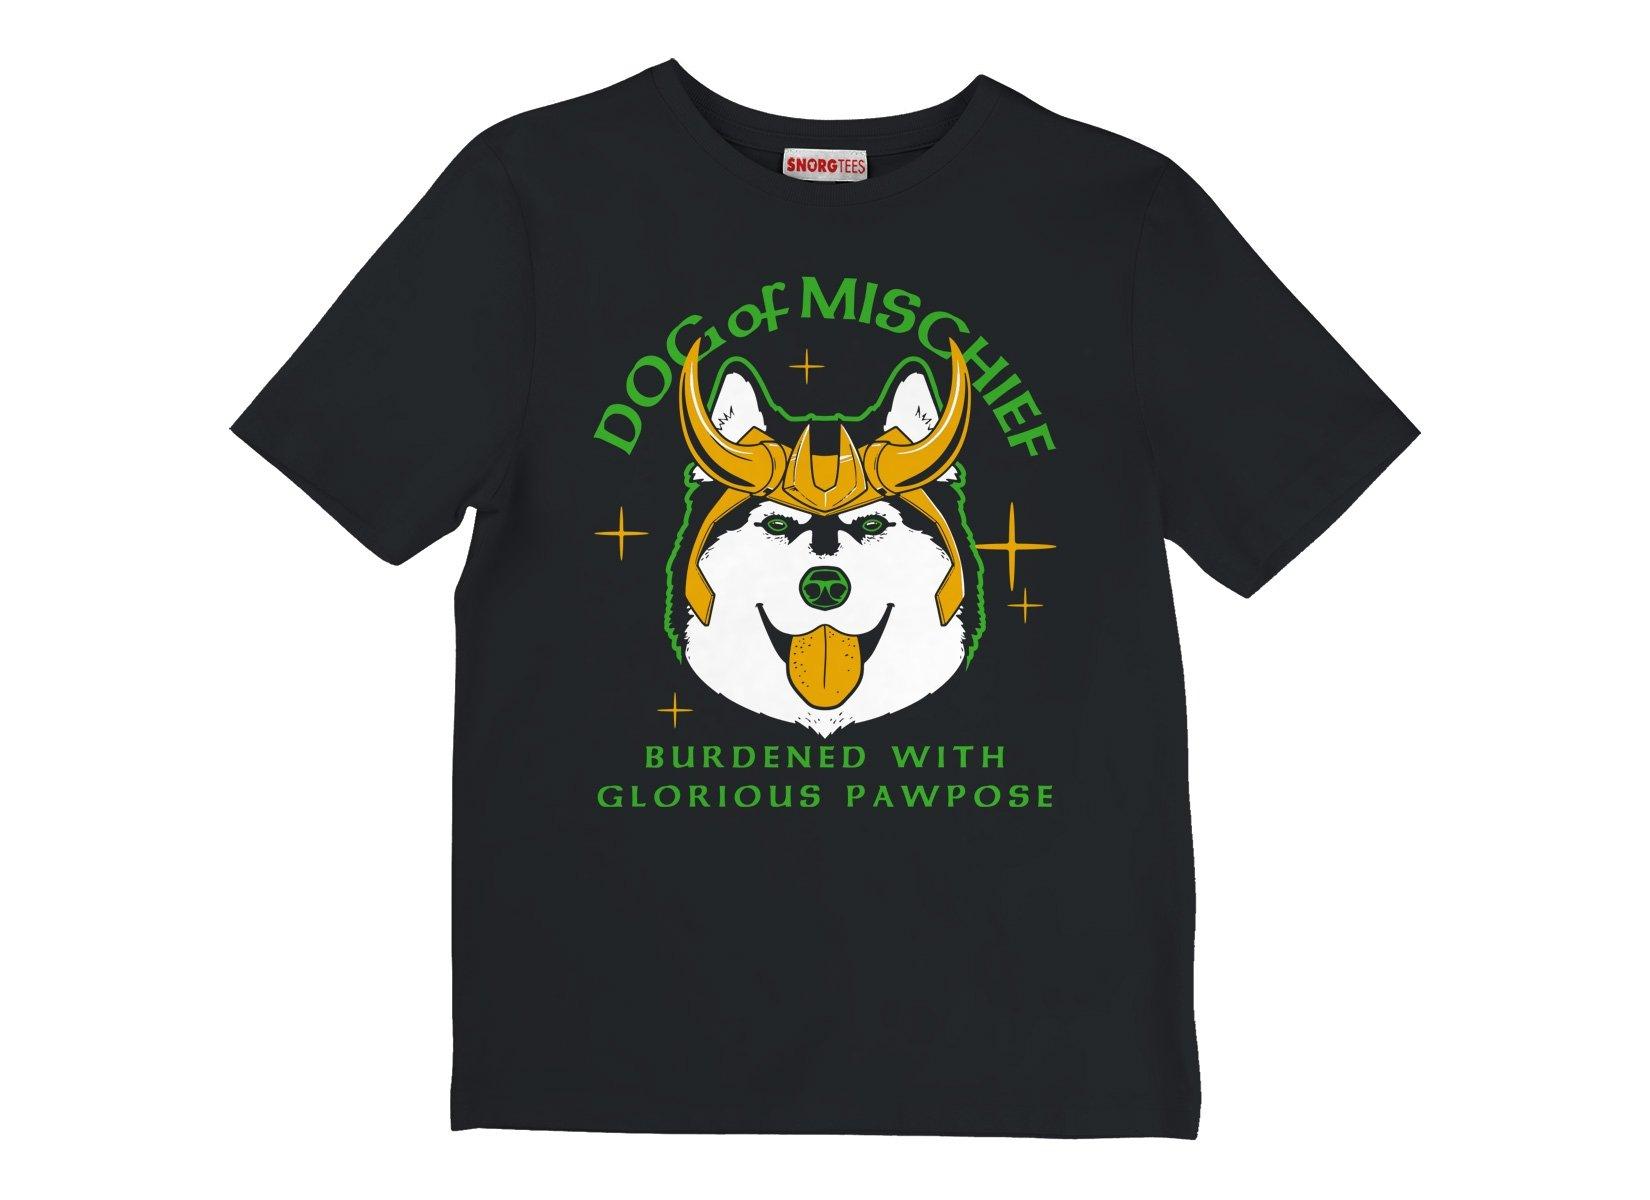 Dog Of Mischief on Kids T-Shirt